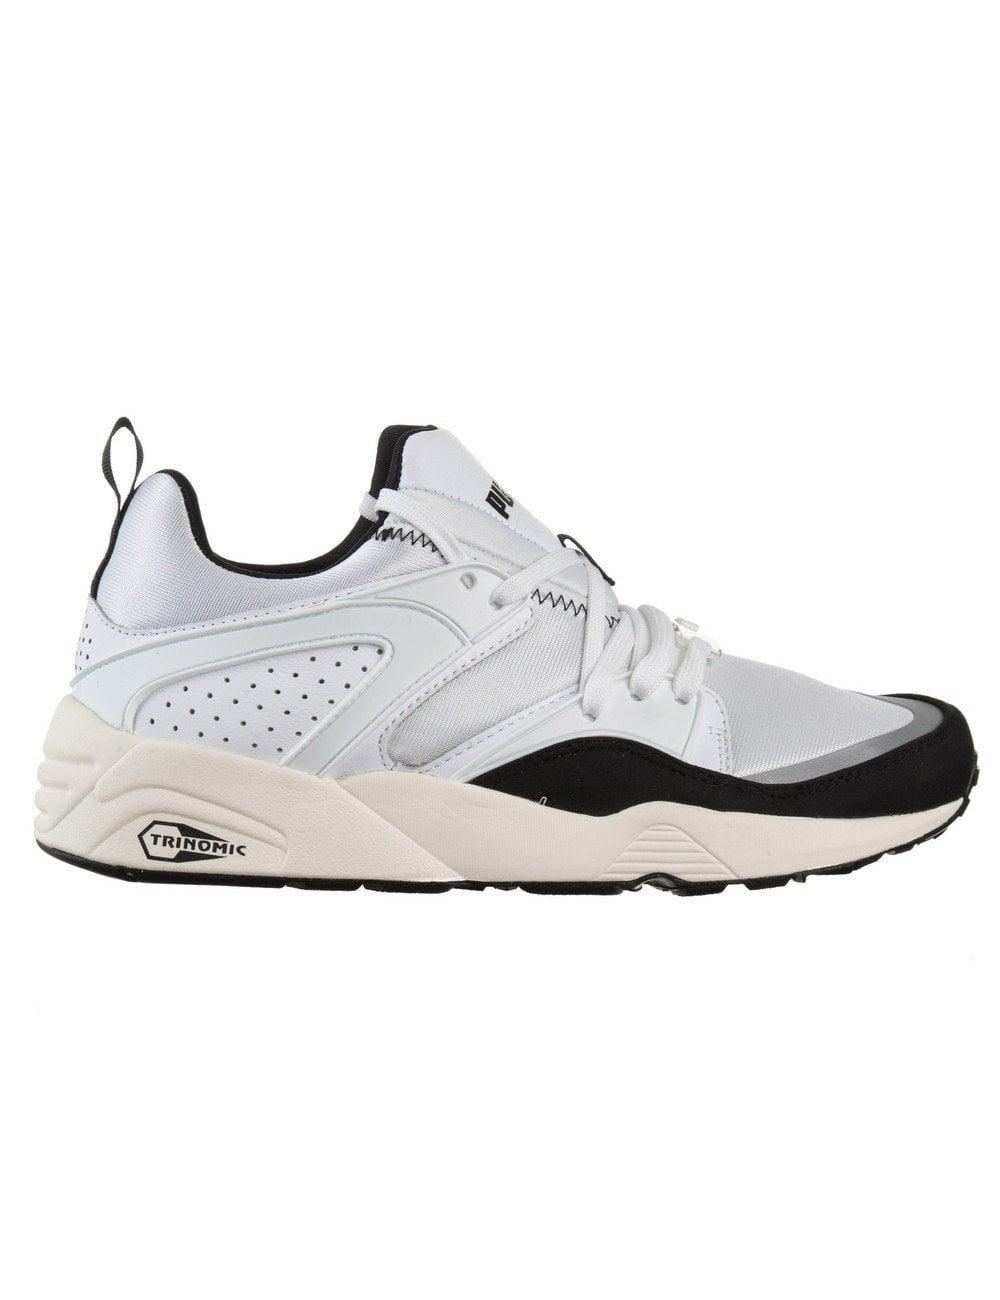 Puma Blaze of Glory Shoes - Black (Primary Pack) 94fd5bc2e